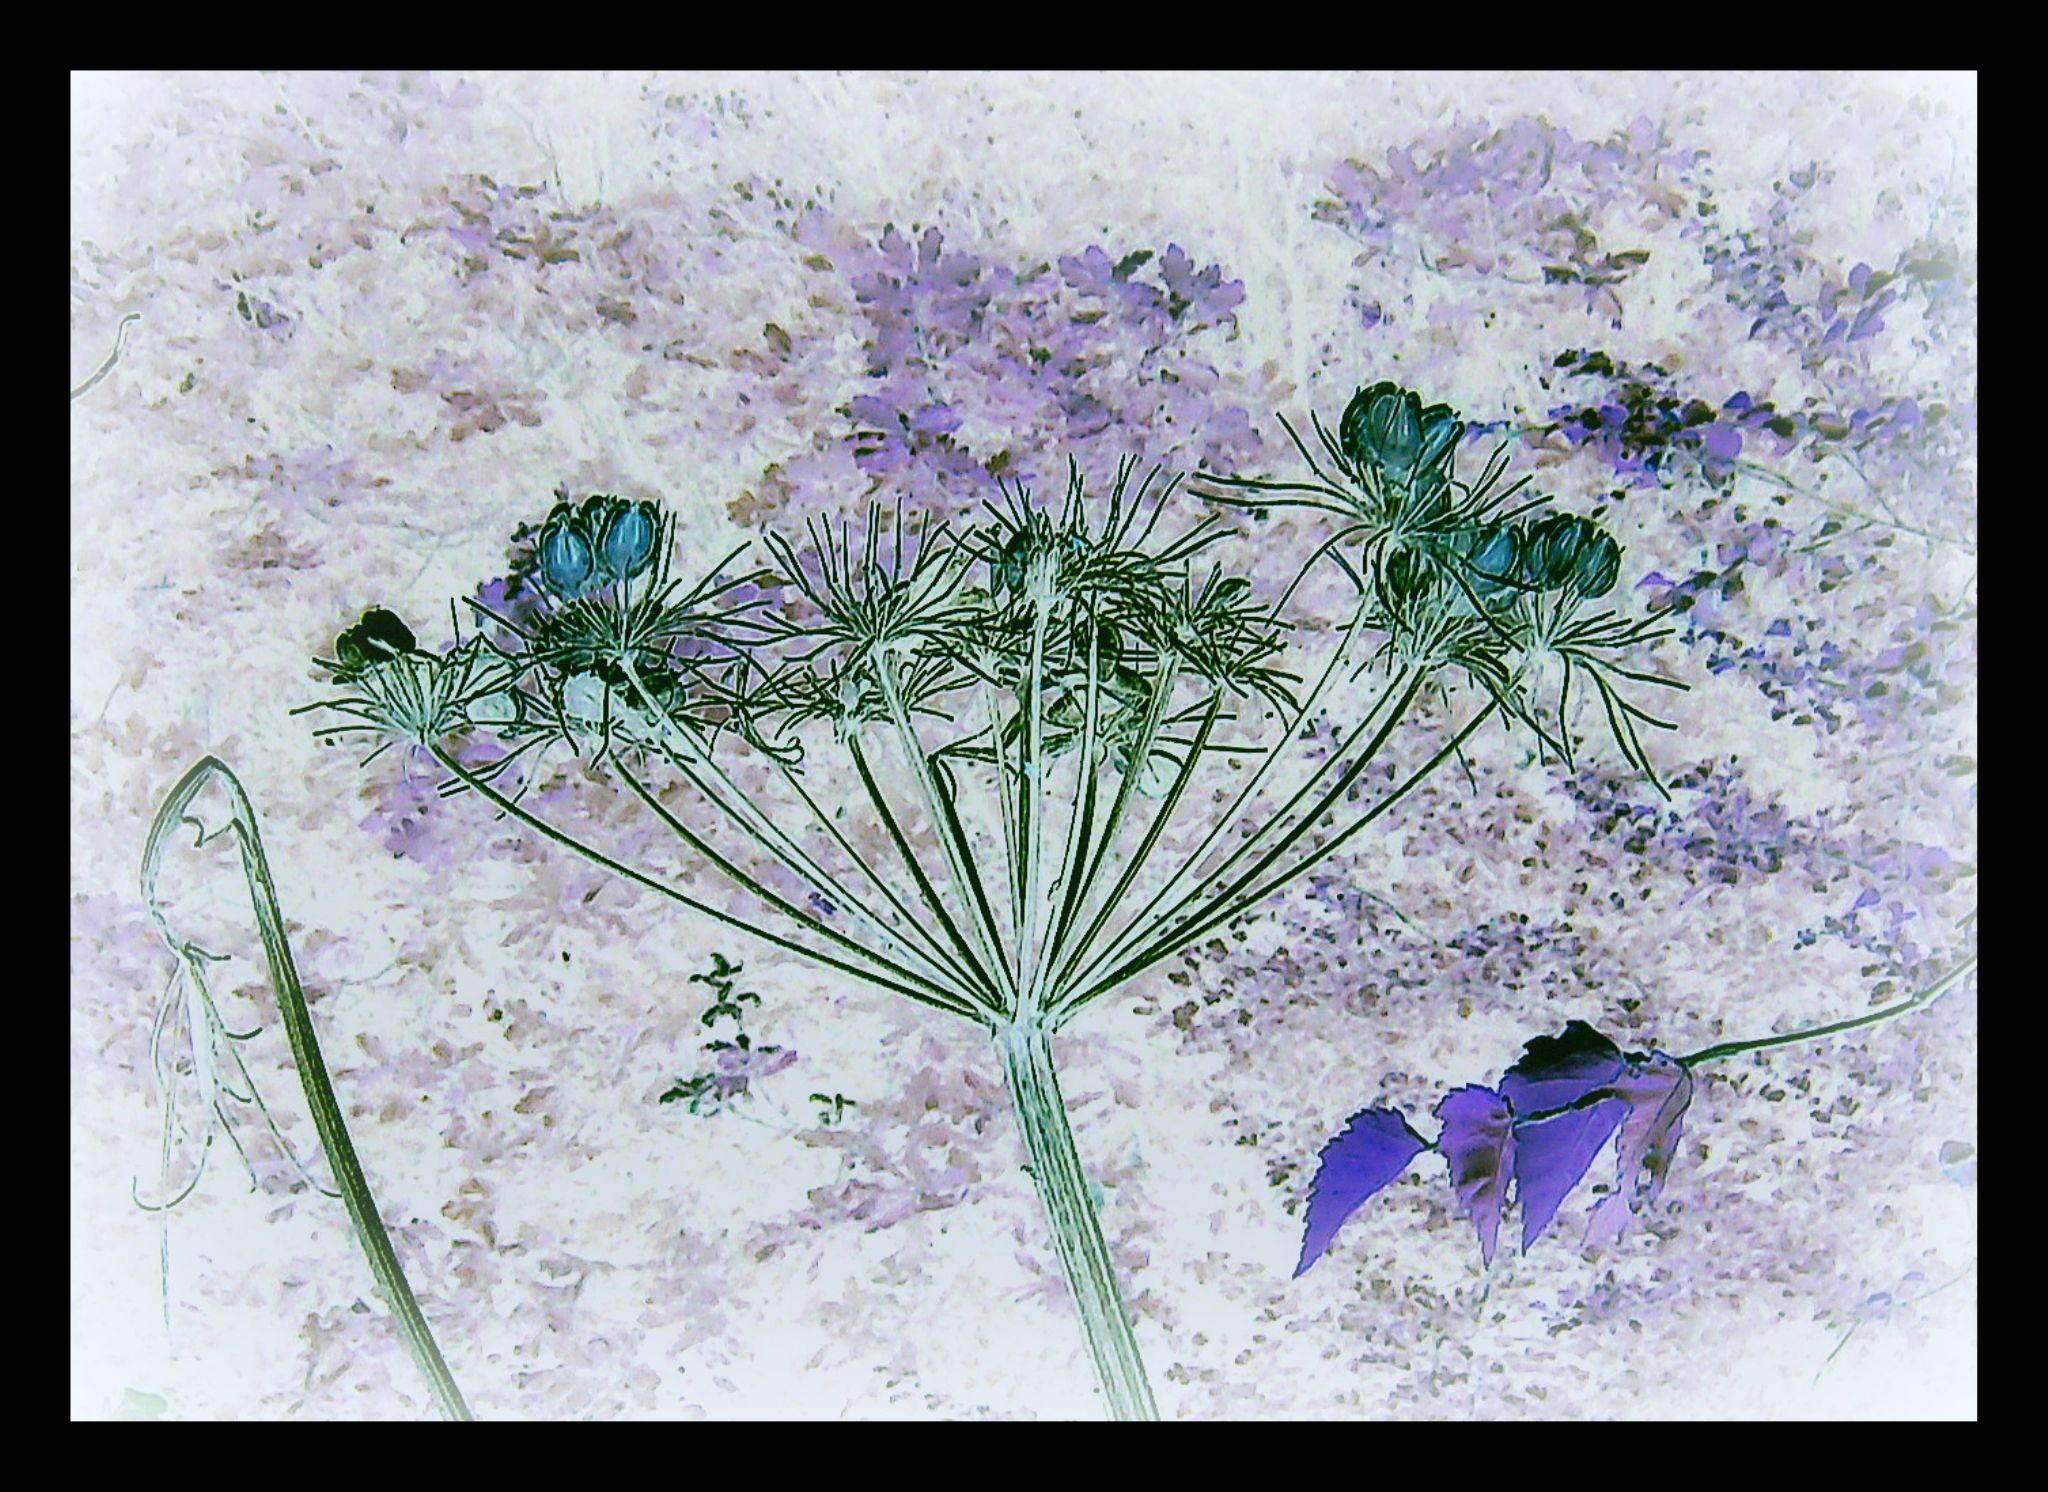 Natures Paintbrush by Michelle Dimascio